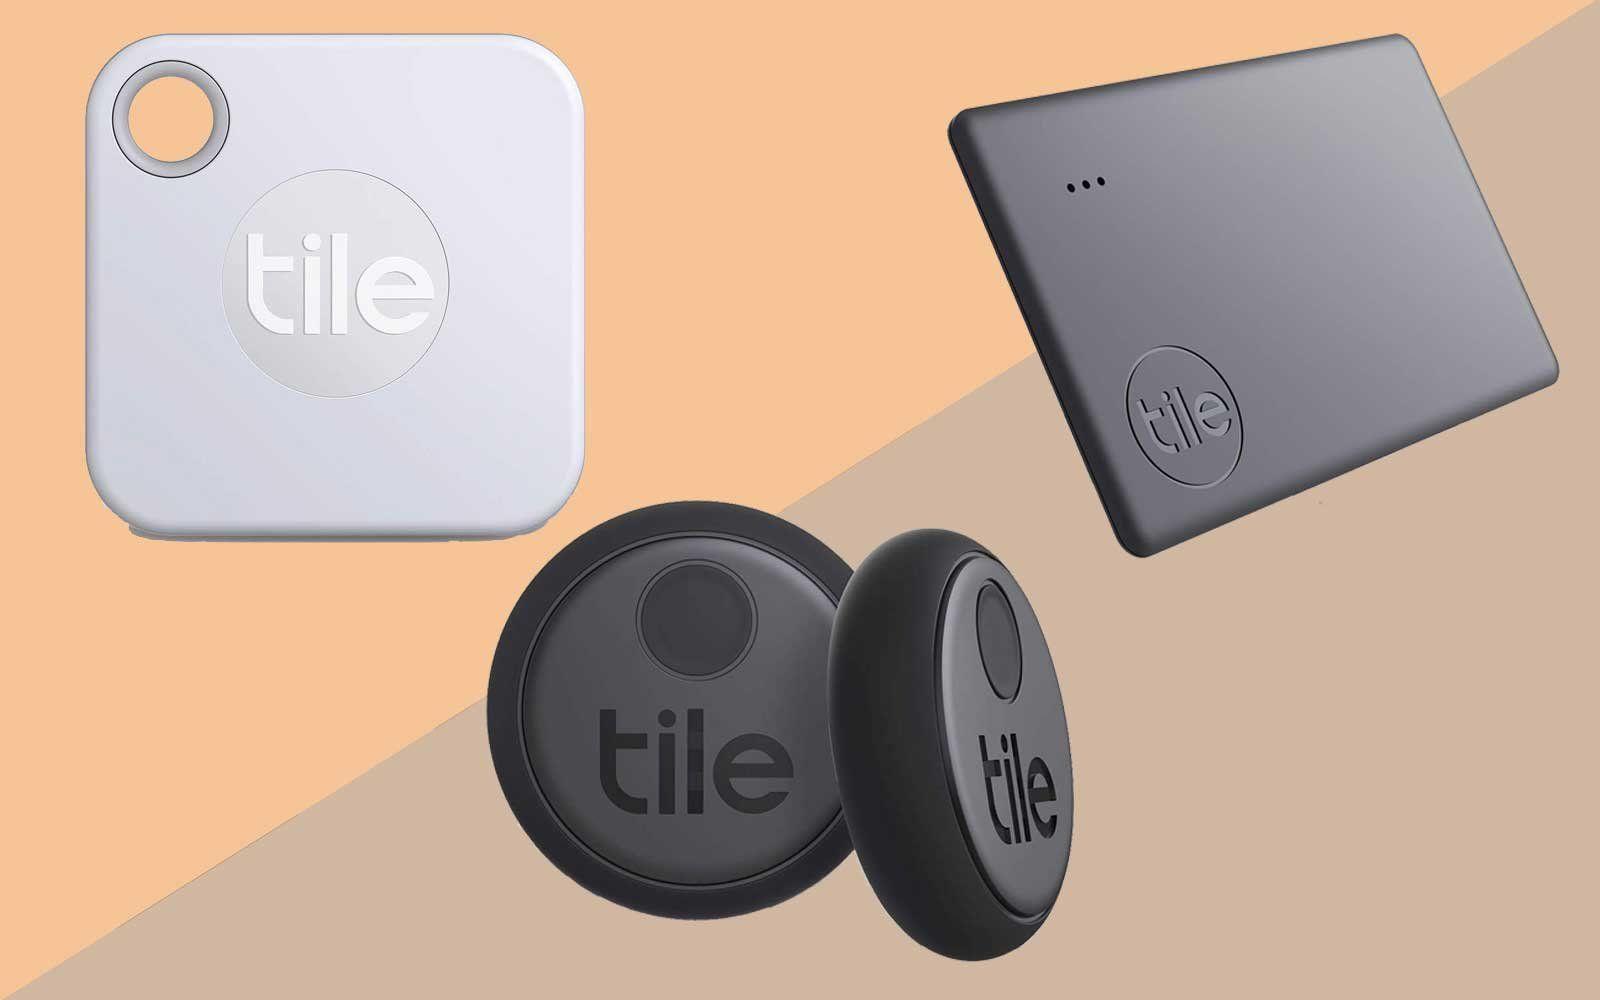 Tile Bluetooth Tracker Combo Set Bluetooth Tracker Tile Bluetooth Tracker Bluetooth Gadgets